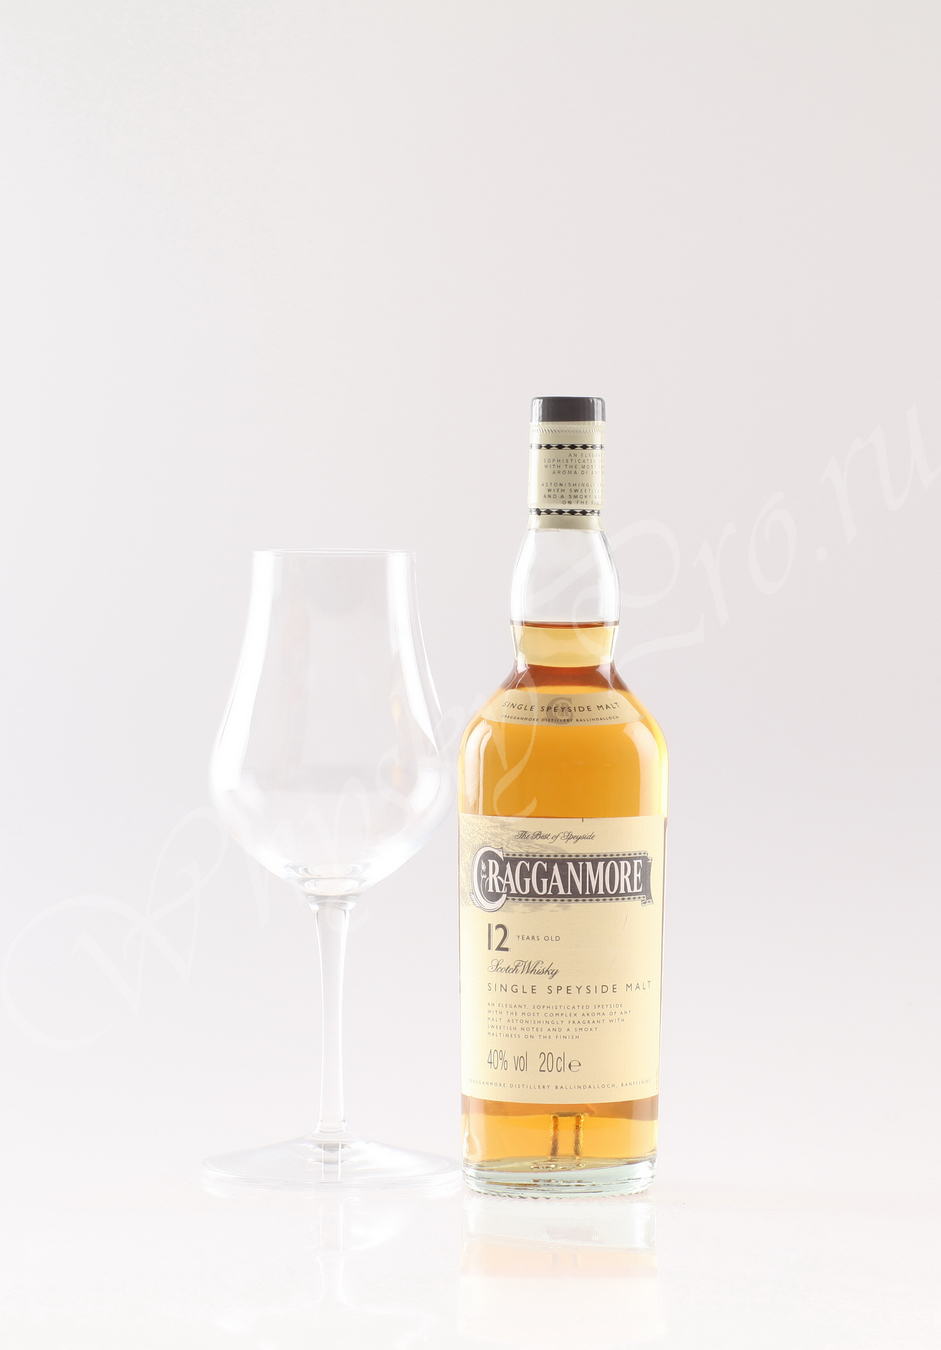 виски Краганмор 12 лет 0.2 л. Шотландский виски Cragganmore 12 years 0.7 l